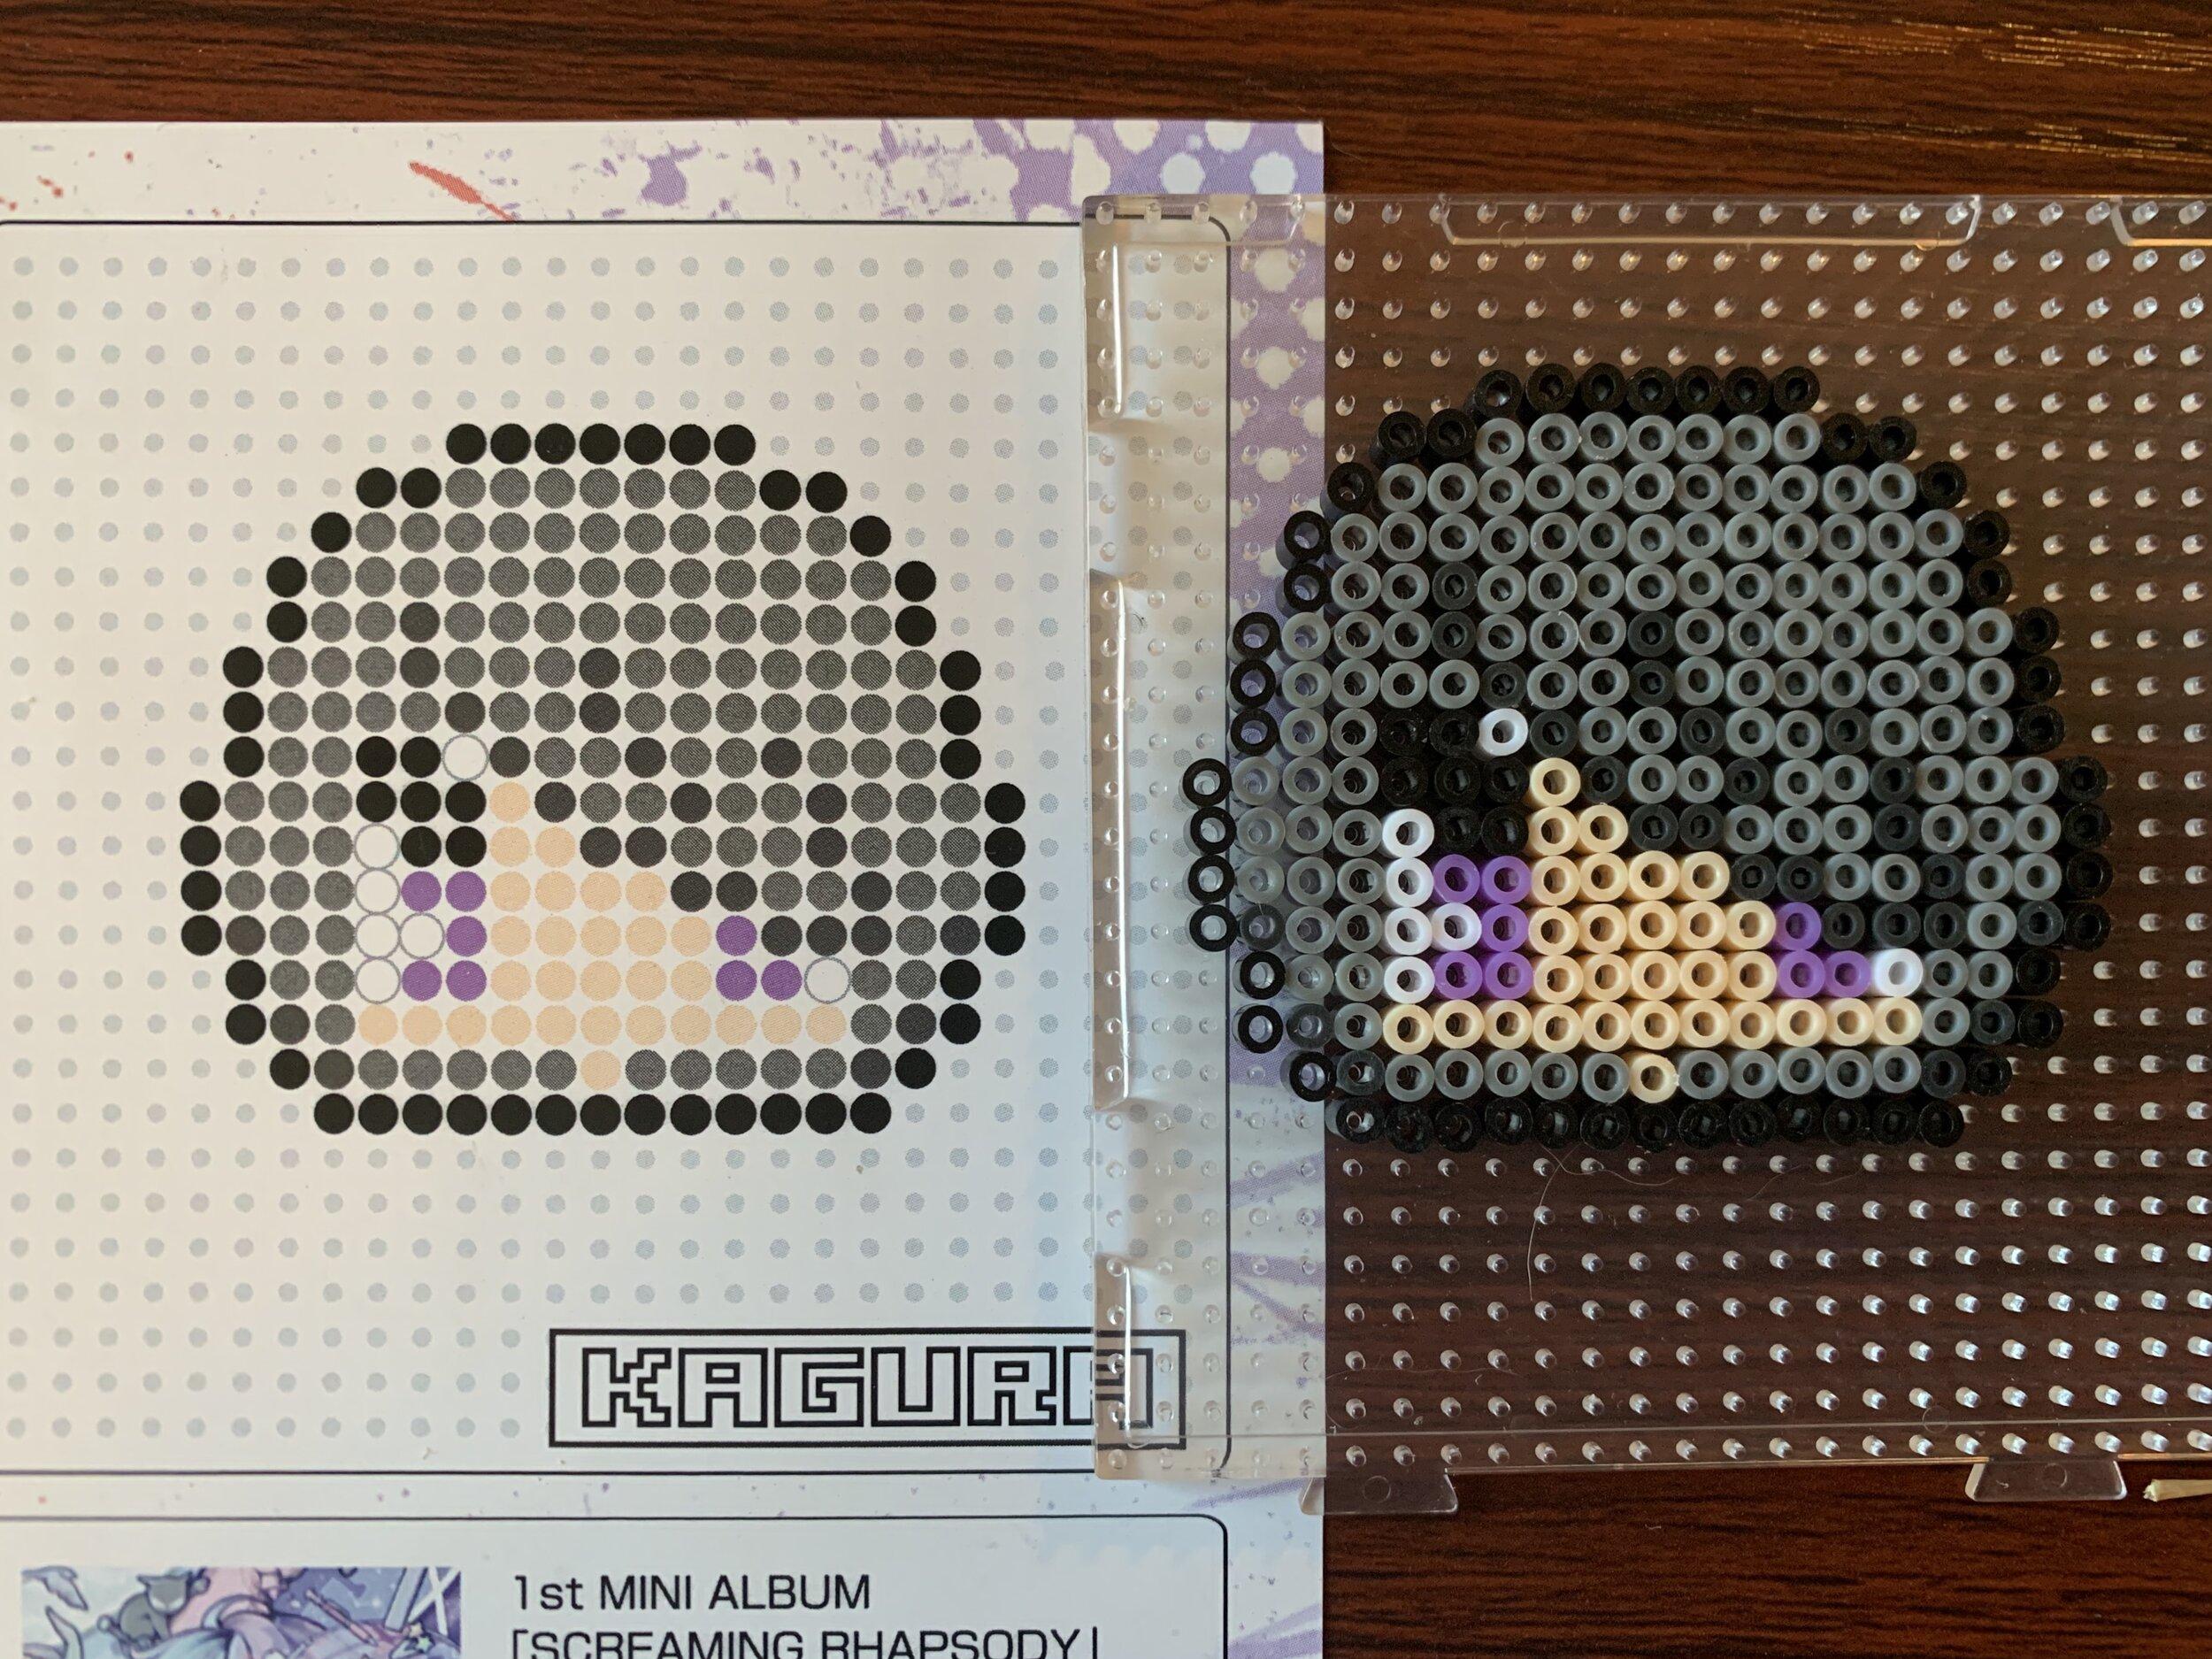 Kagura beads applied to pin board